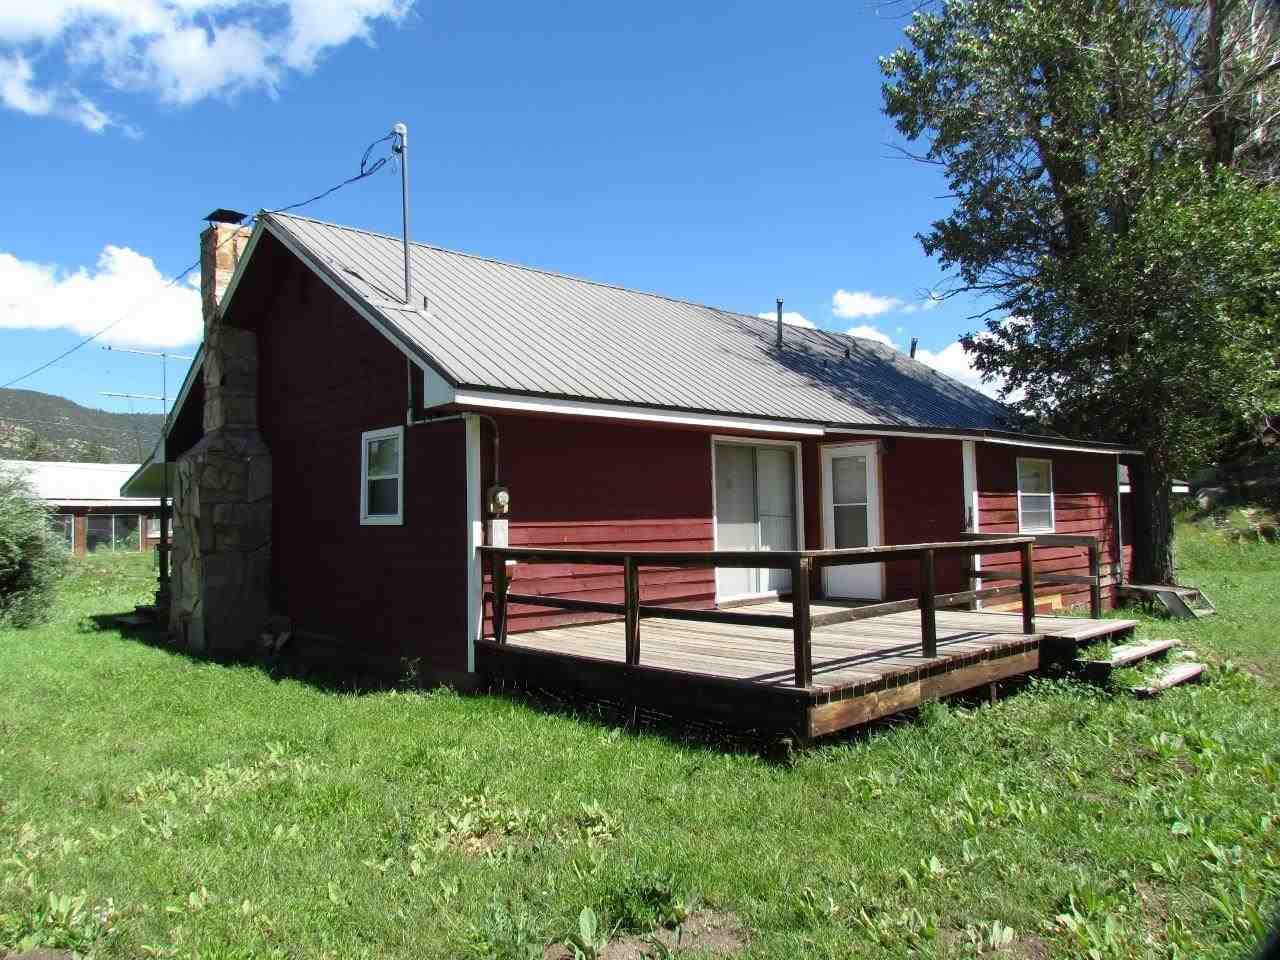 136 Hummingbird Lane, Ute Park, NM 87749